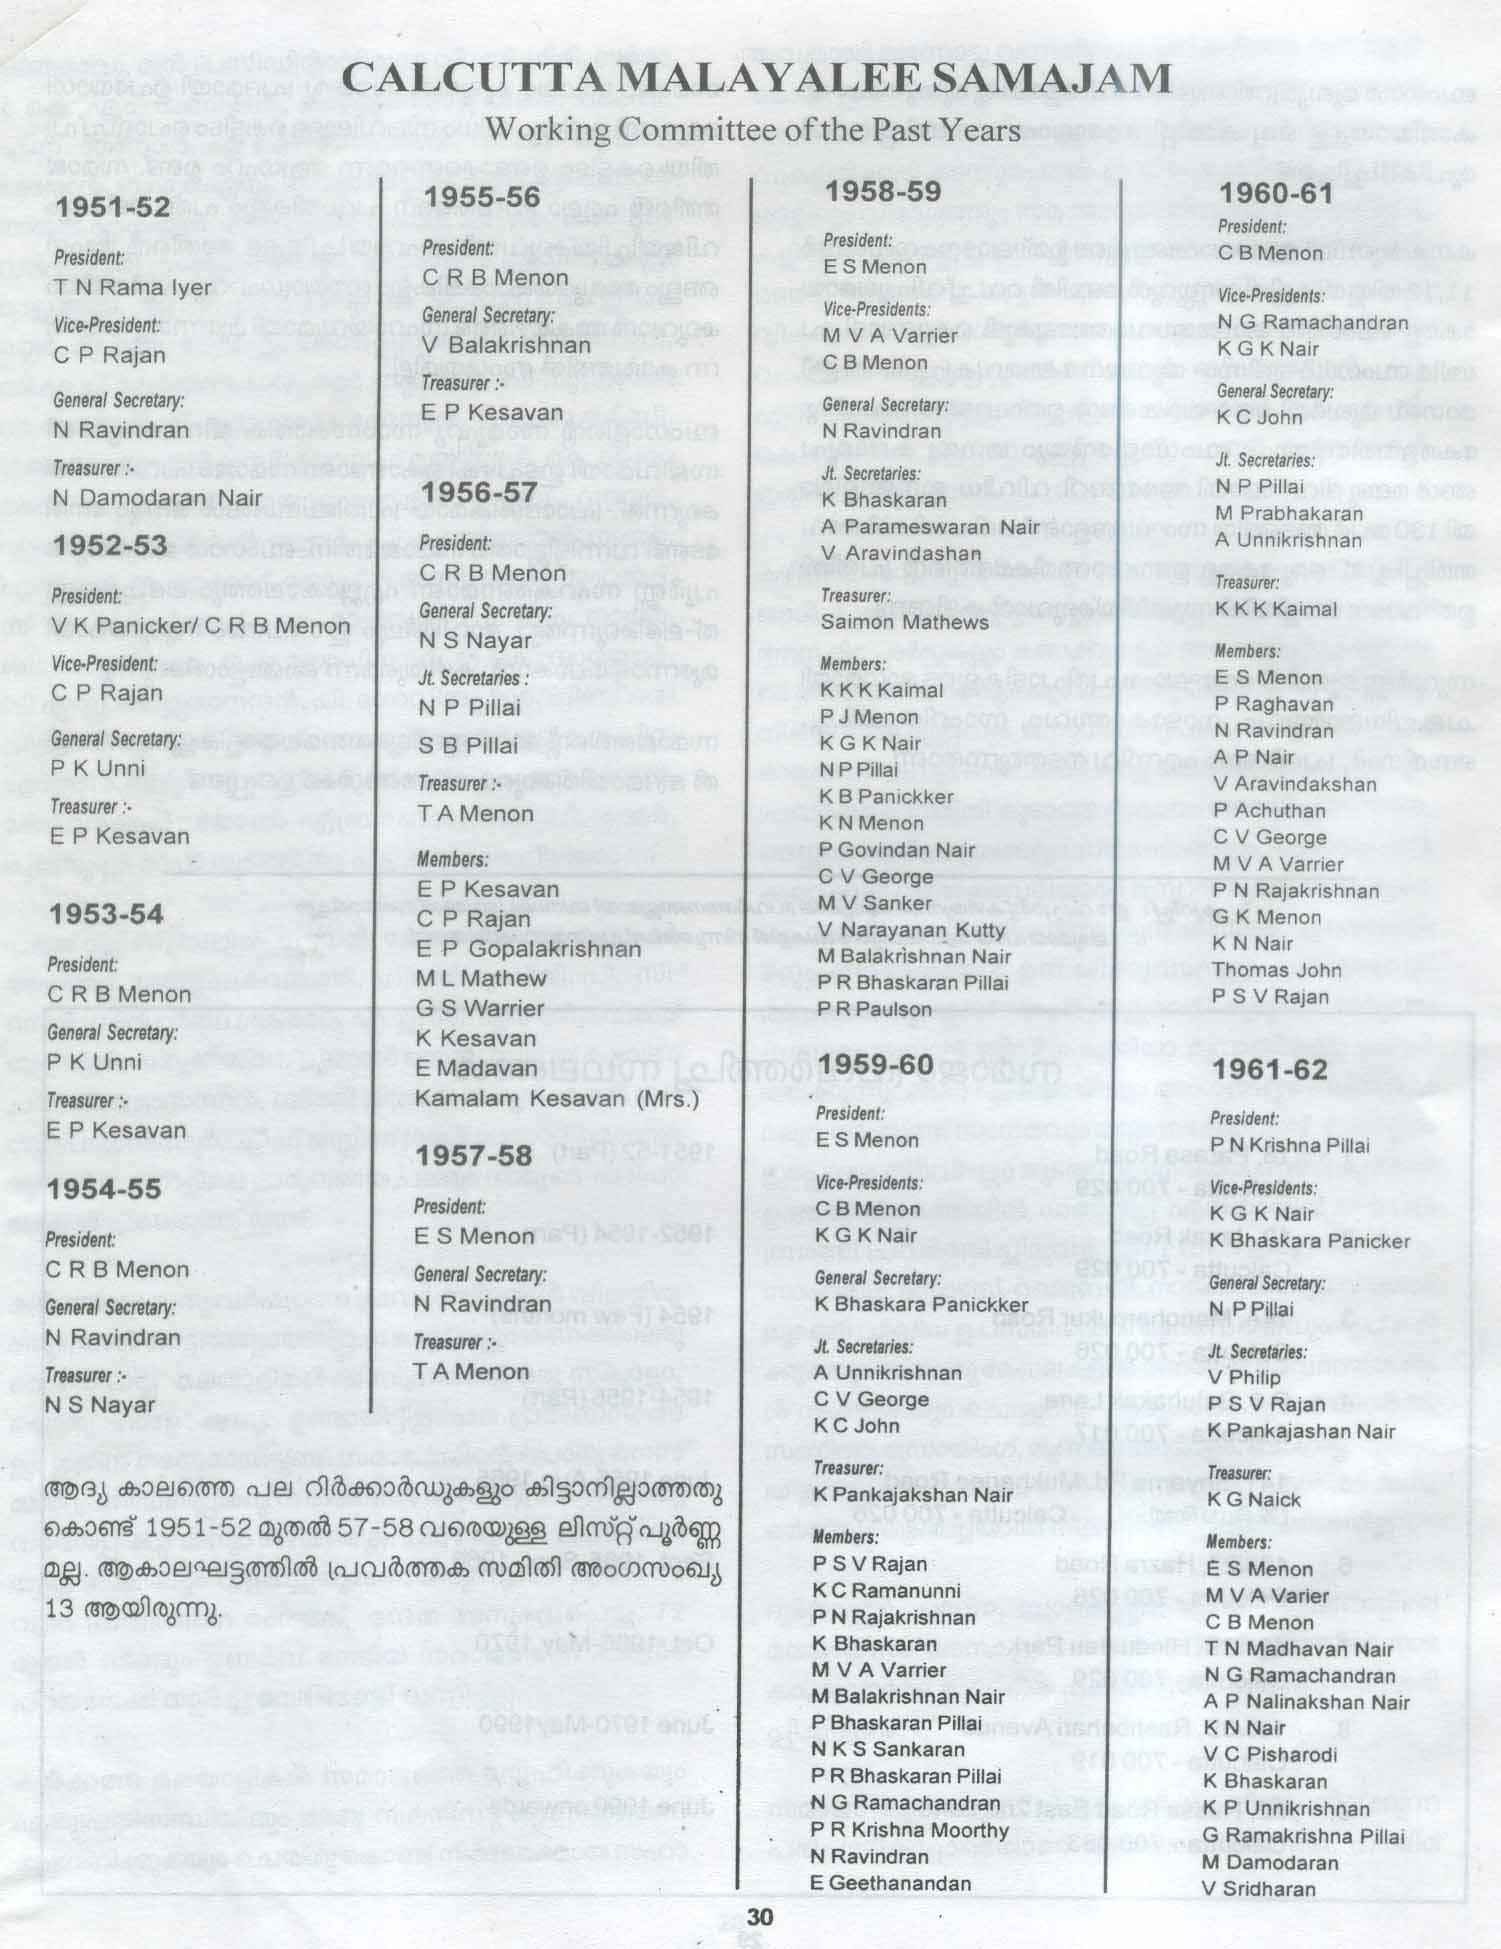 Samajam OldWorking Committee list-1